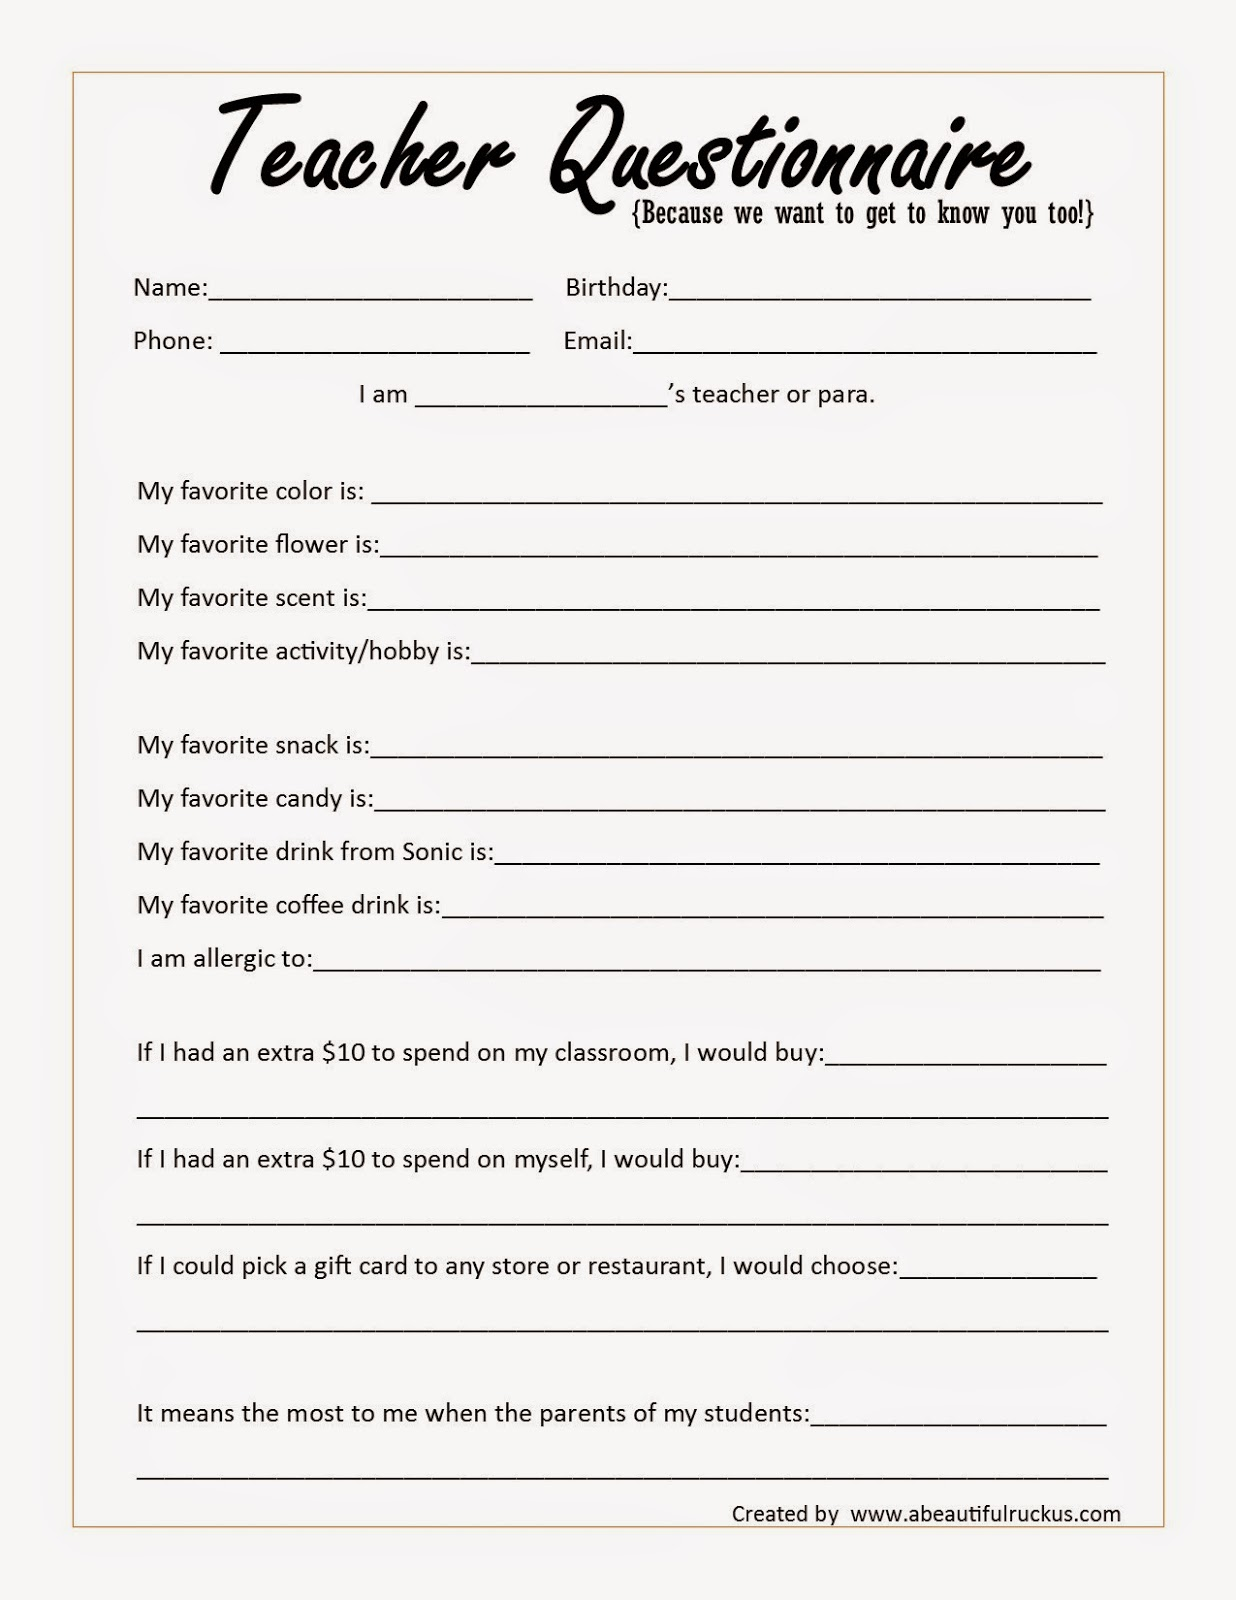 Teacher Appreciation Survey Questions